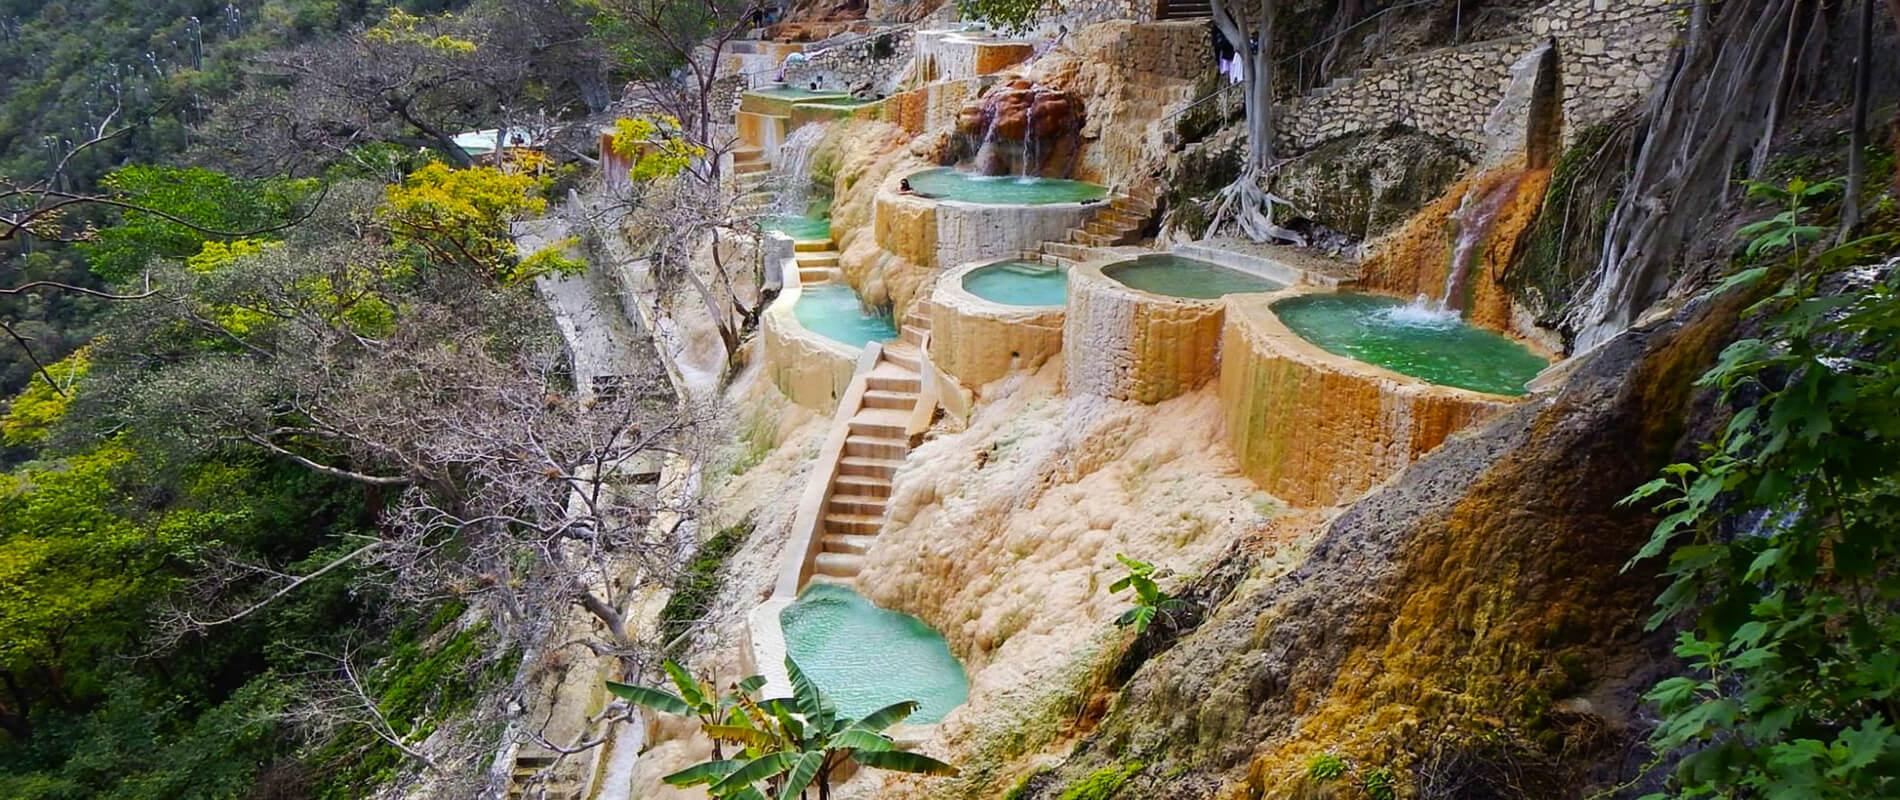 Grutas de Tolantongo, the Extraordinary Natural Hills of Hidalgo